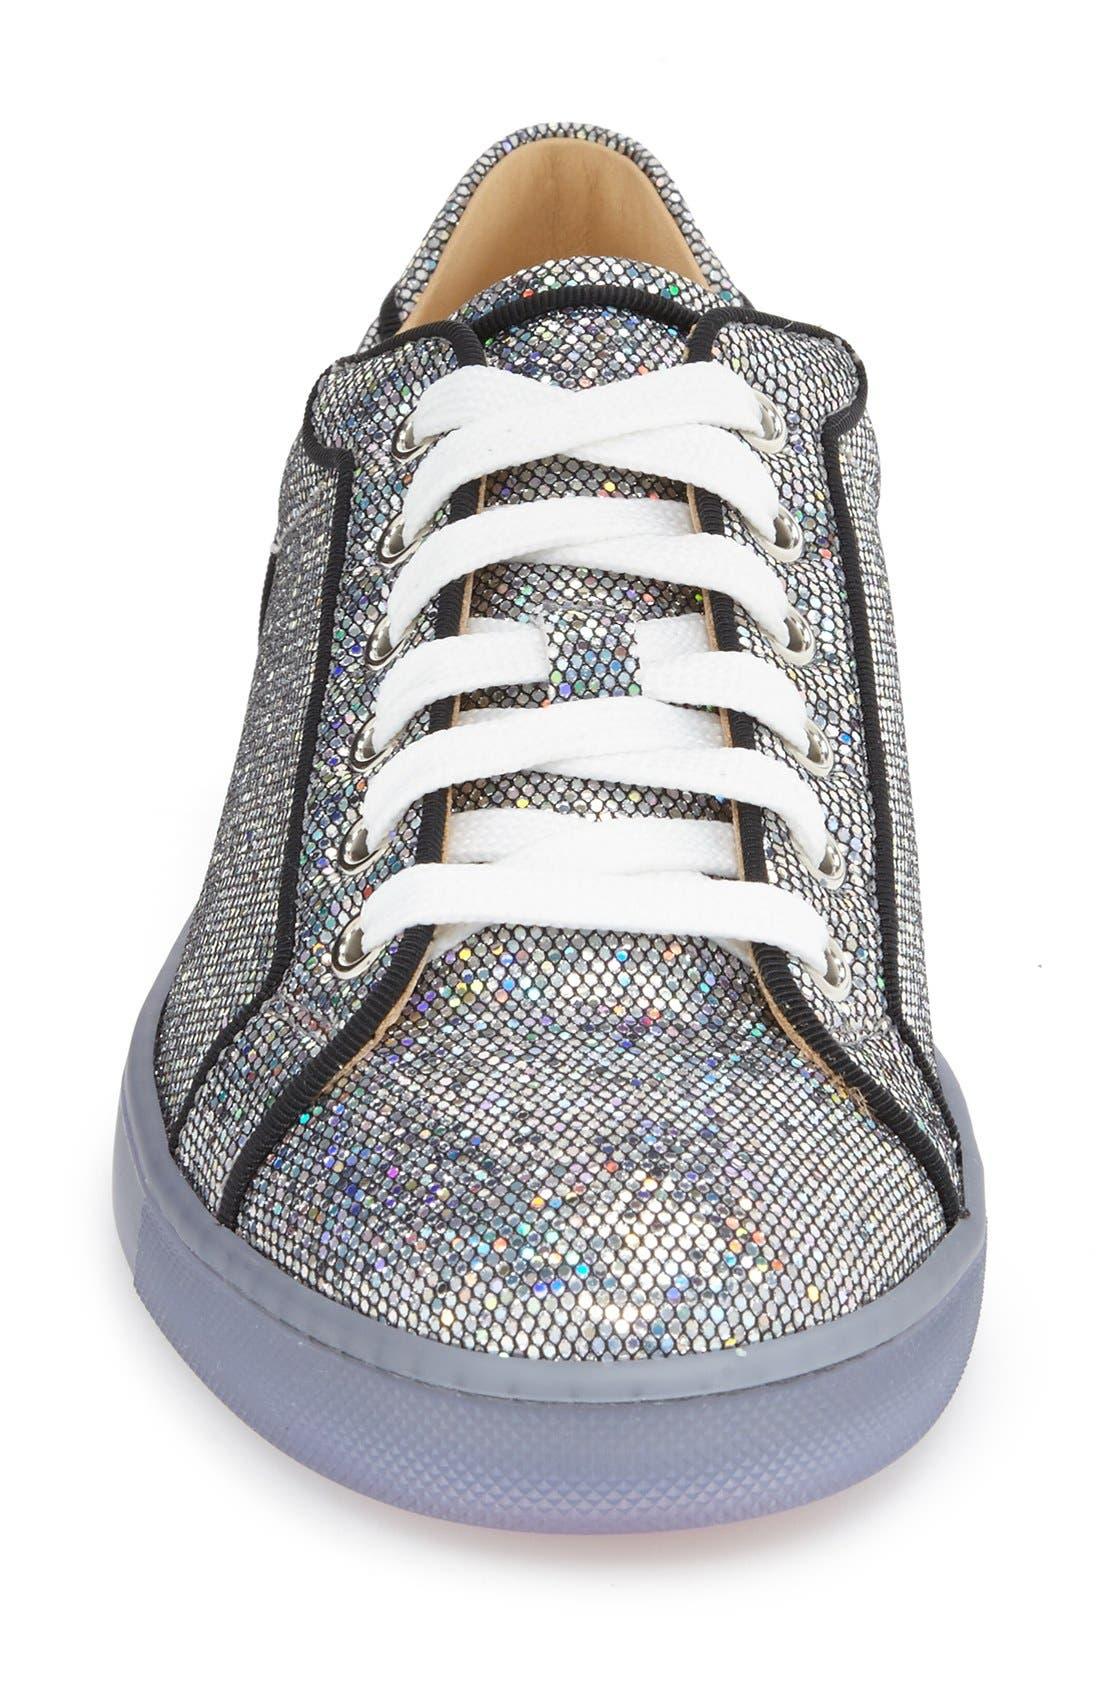 'Seava' Disco Ball Glitter Sneaker,                             Alternate thumbnail 3, color,                             040